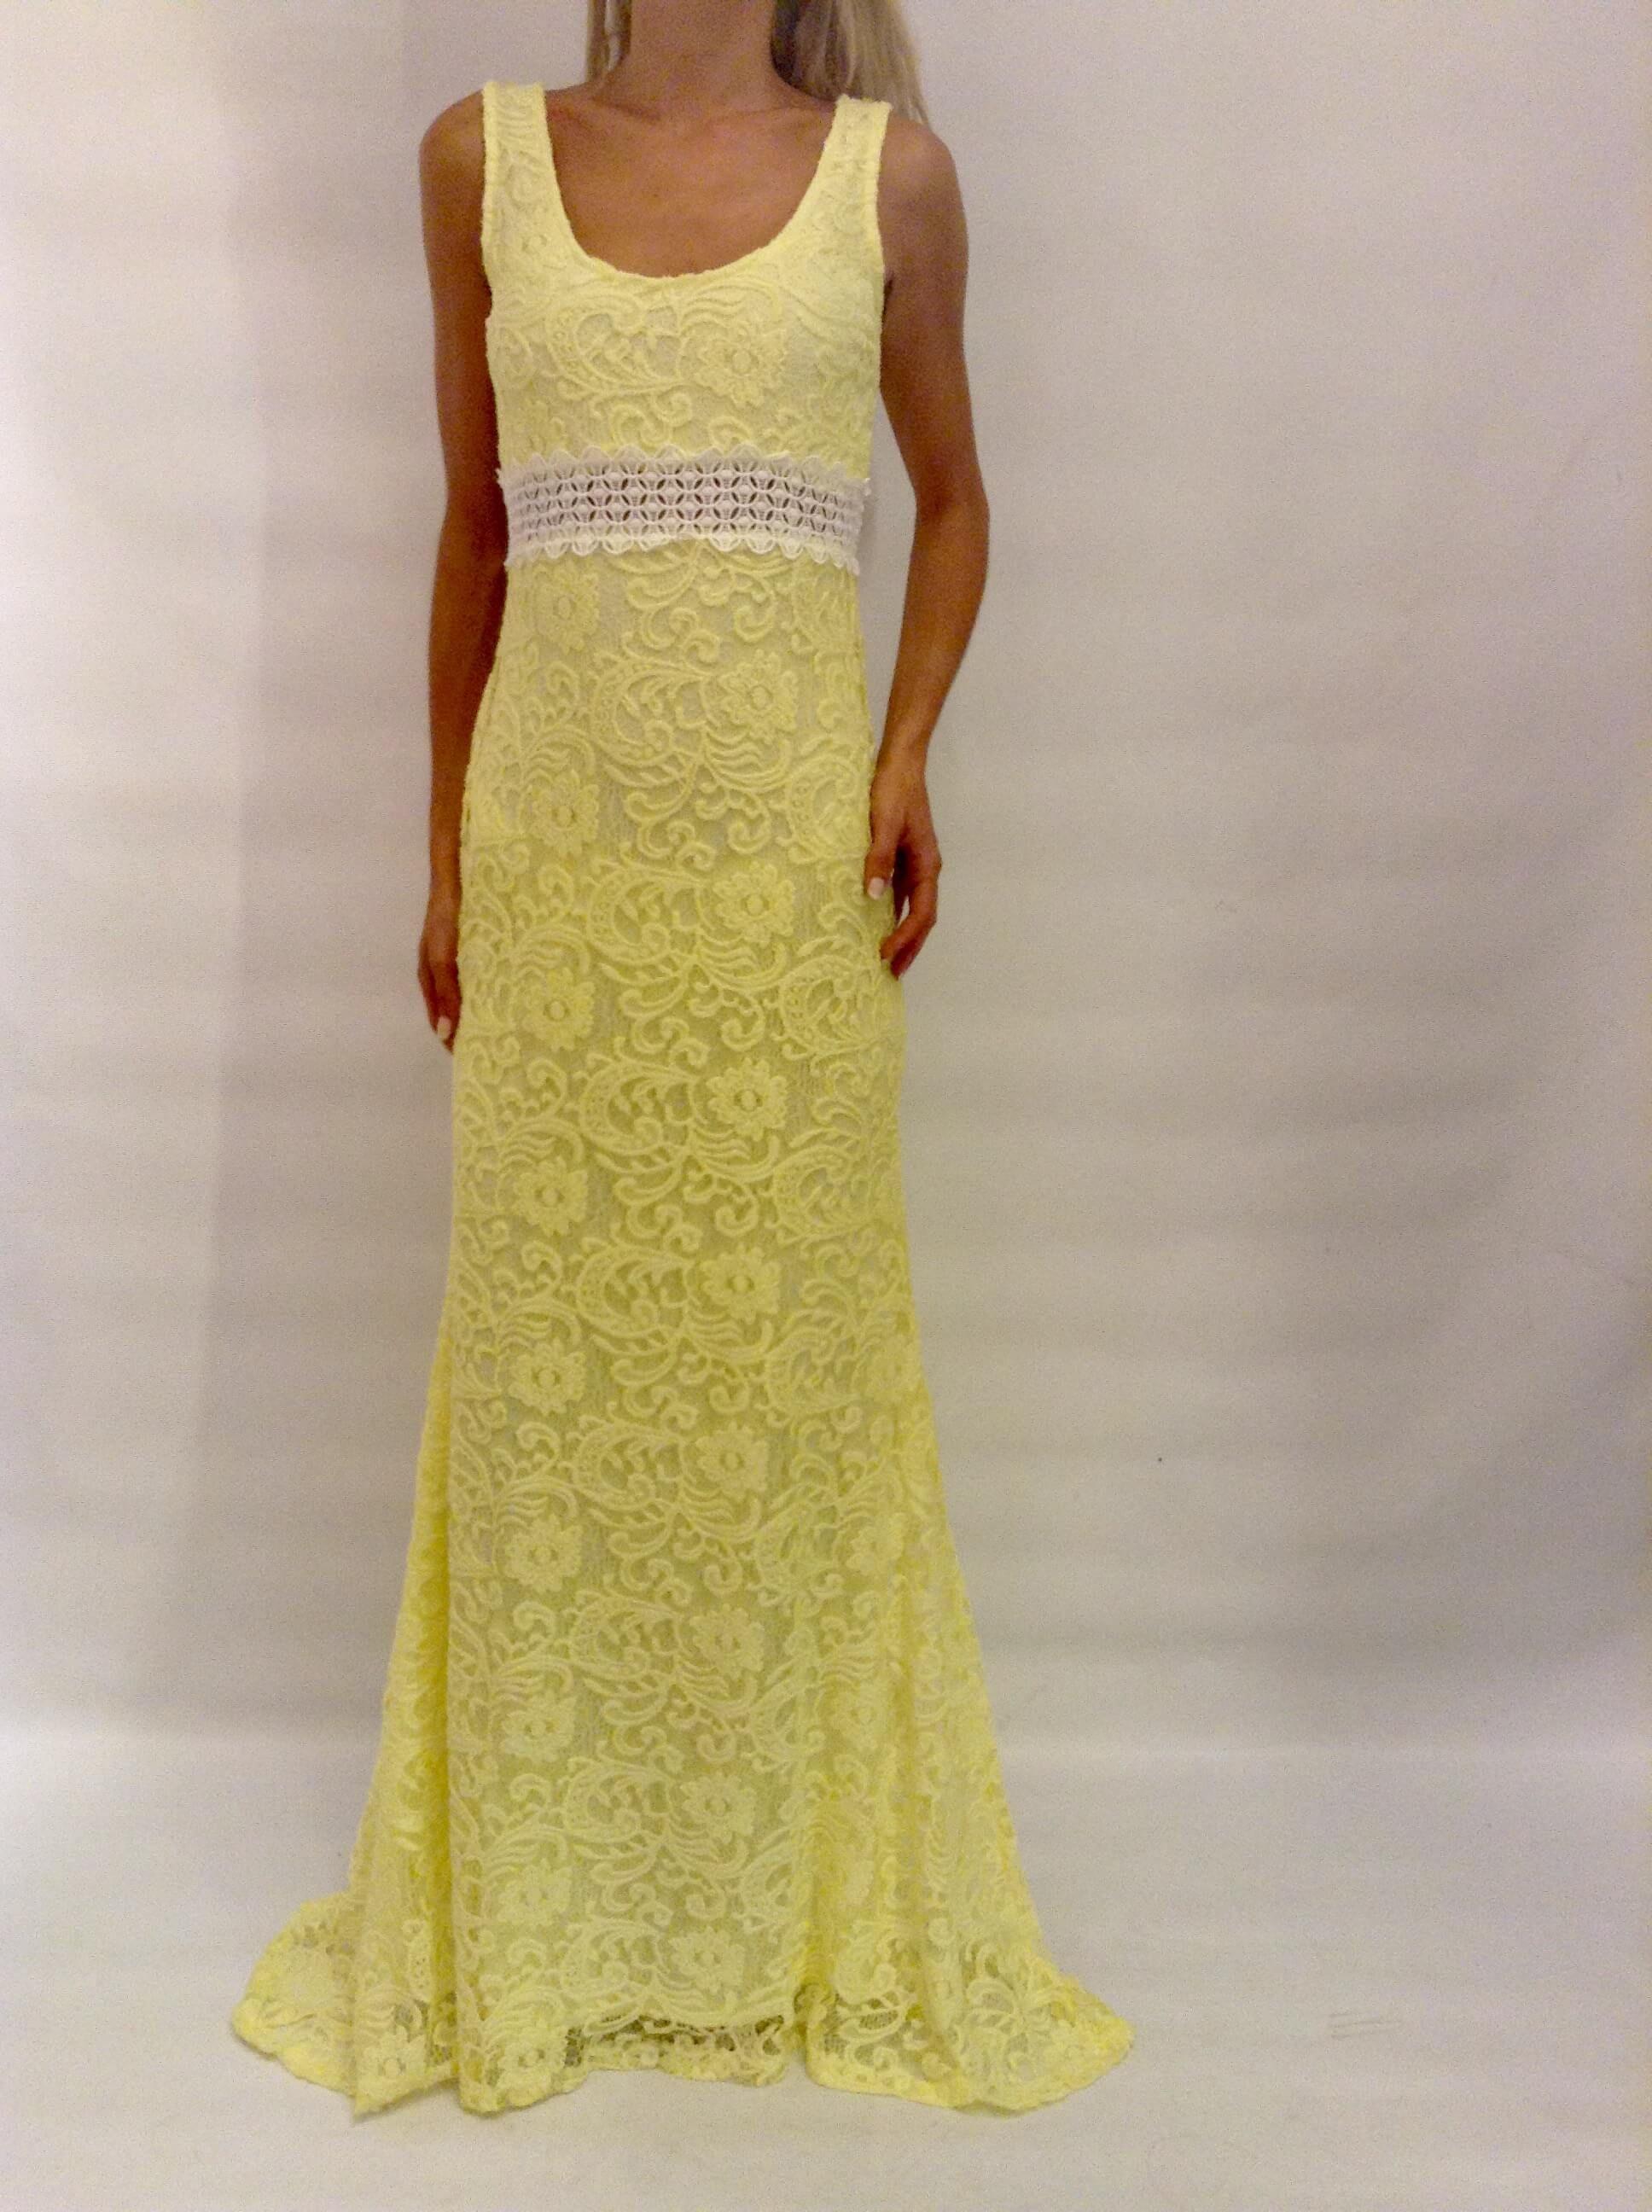 94368d05fef6 Maxi φόρεμα από δαντέλα στο www.primadonna.com.gr